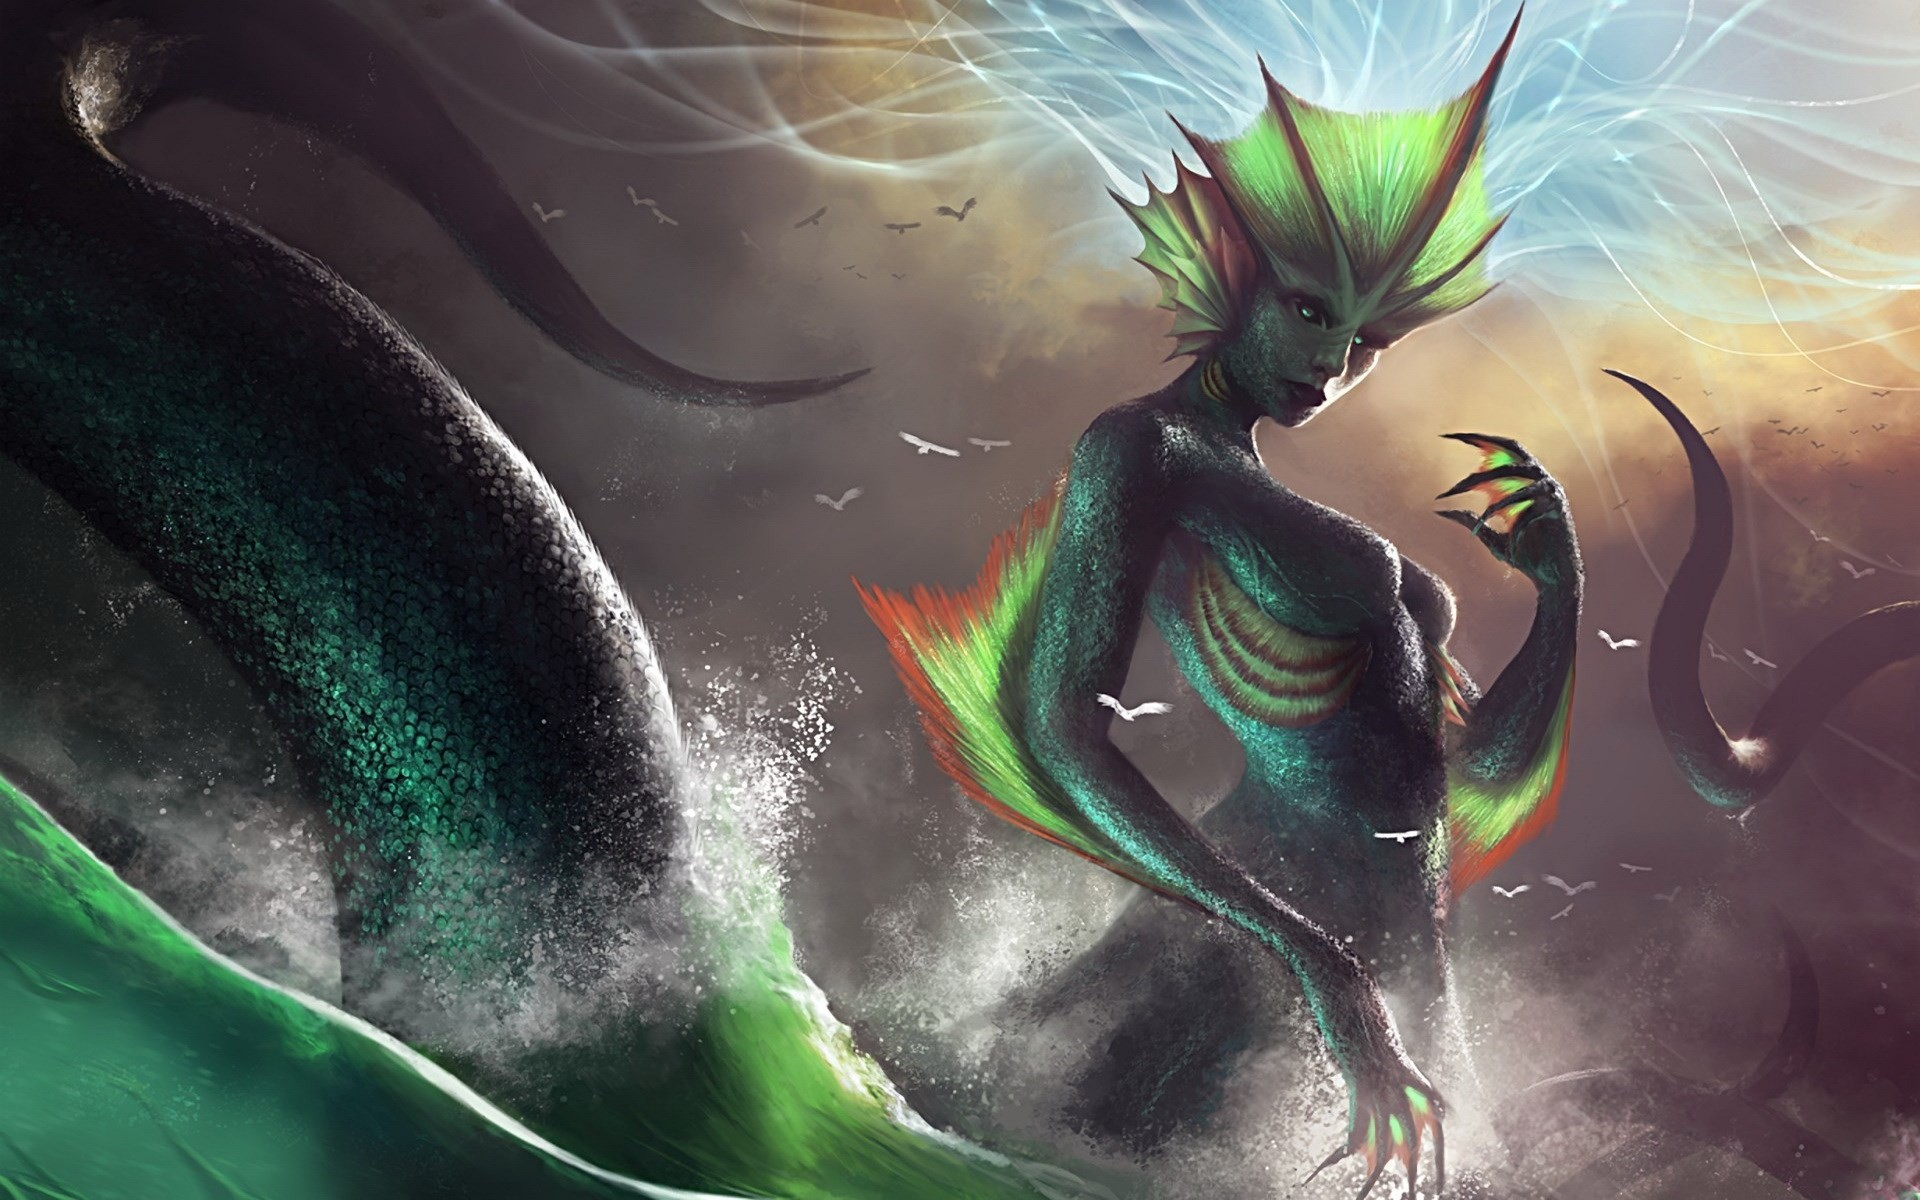 free screensaver wallpapers for mermaid. Free download mermaid